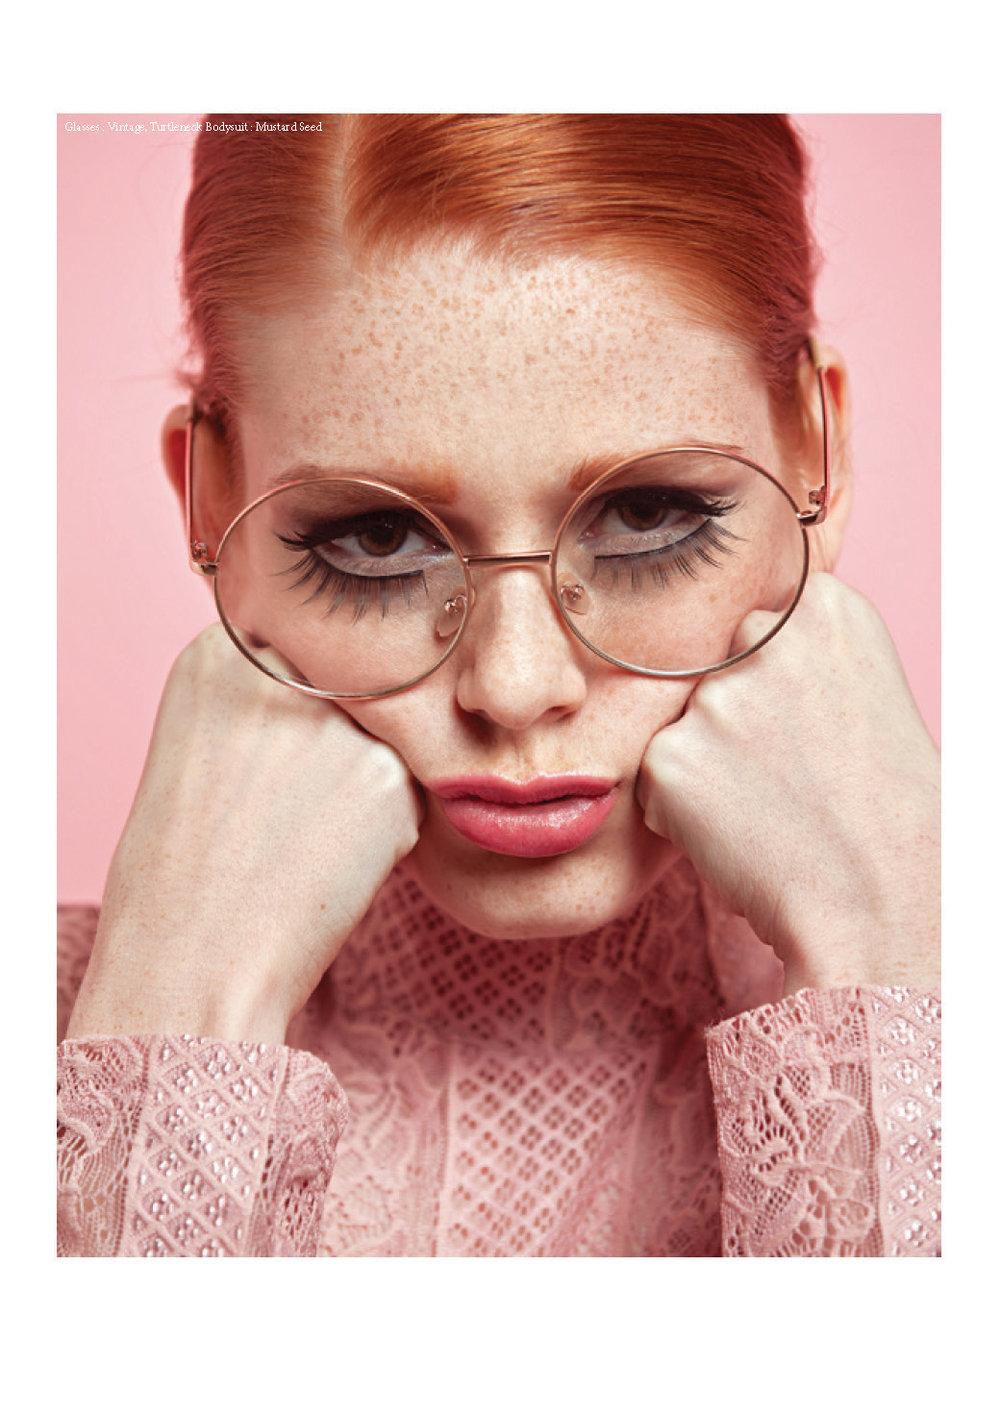 Emilie_Tournevache_Fashion_Editorial_Photographer_montreal